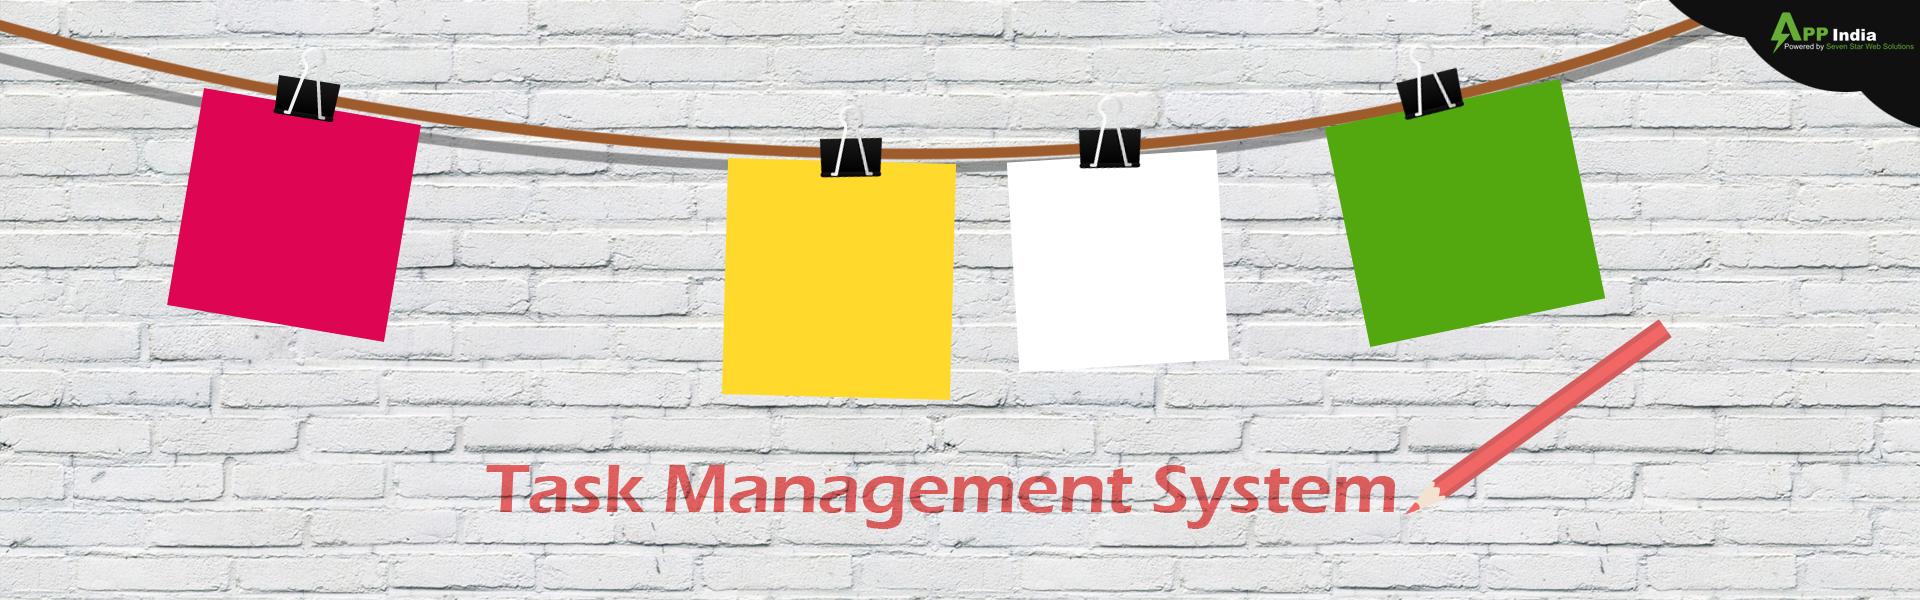 Task Management System or TMS